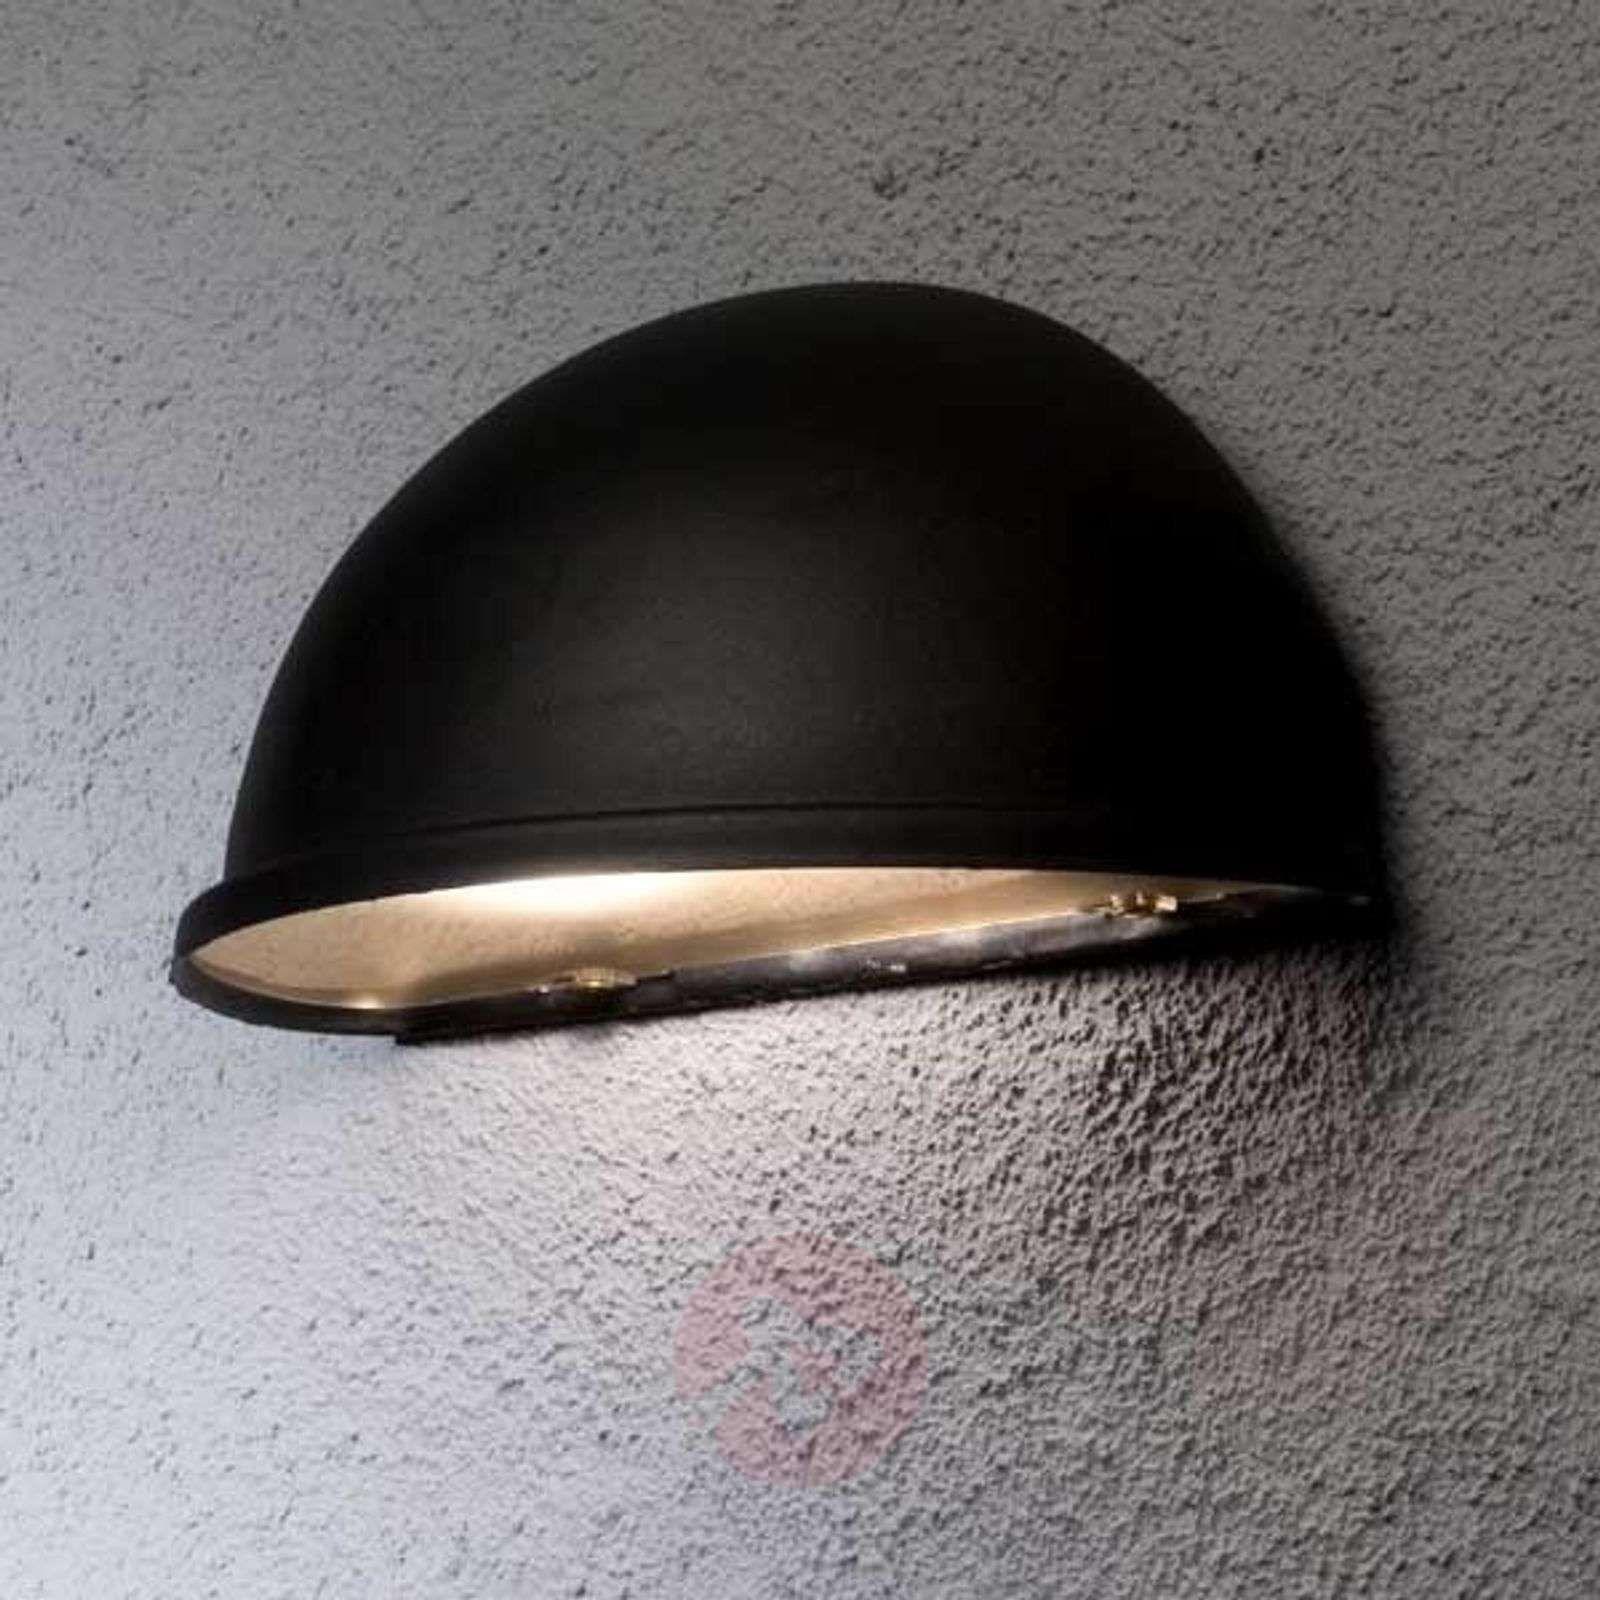 Zewnetrzna Lampa Scienna Torino E27 Czarna Outdoor Wall Lighting Outdoor Wall Lamps Wall Lights